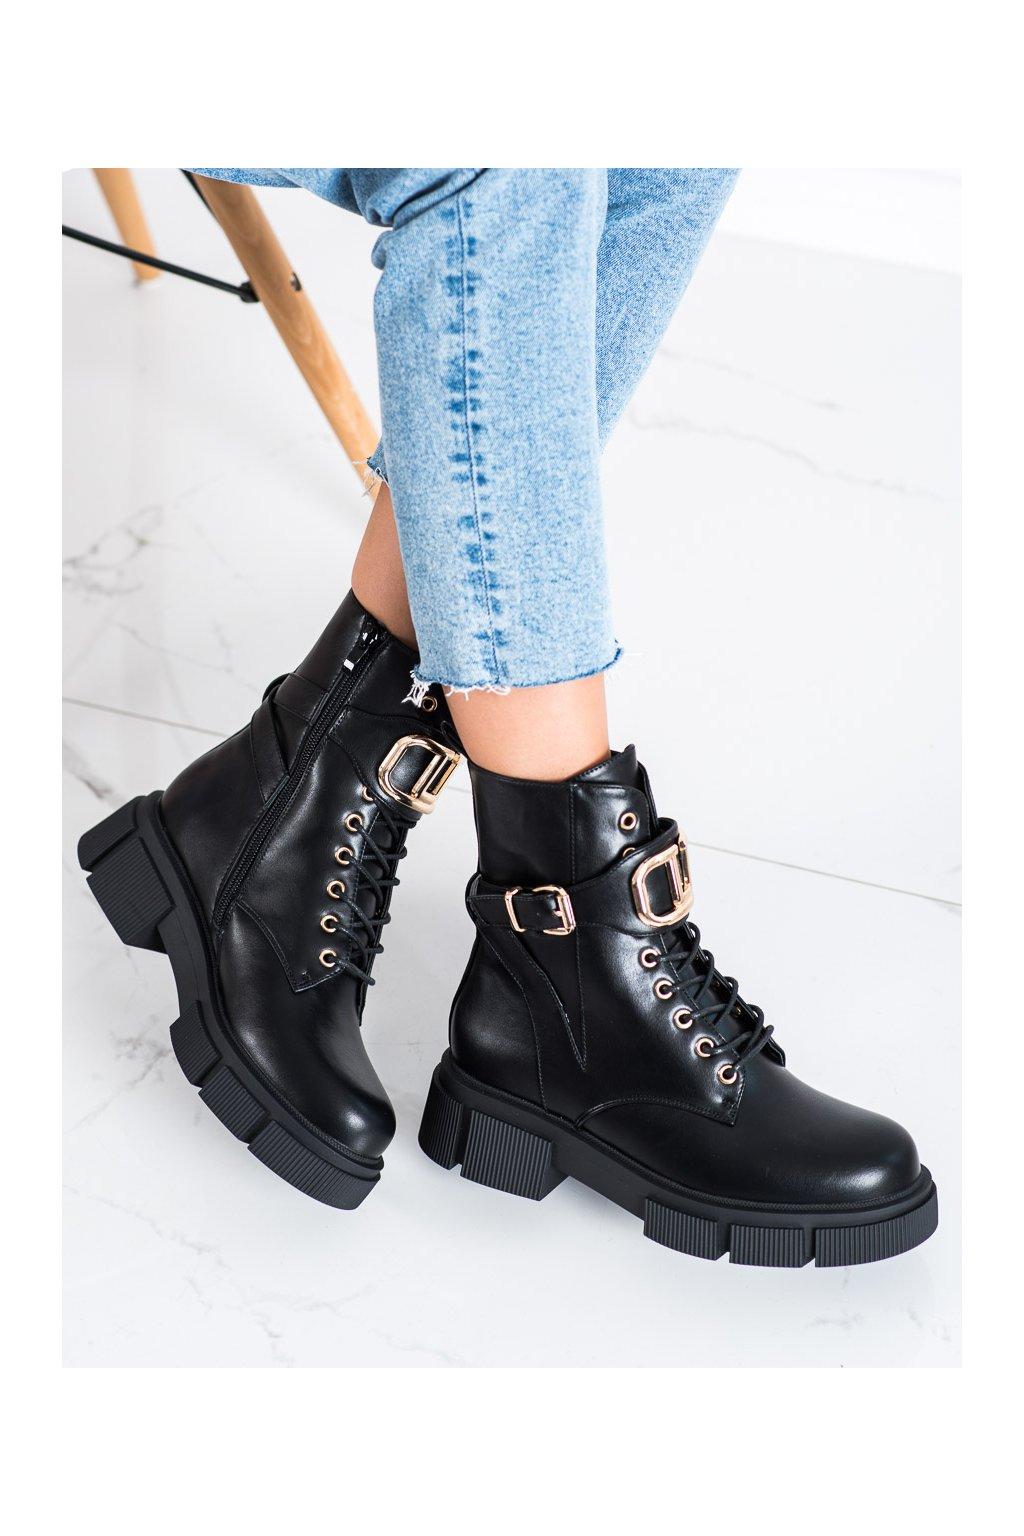 Čierne dámske topánky Seastar kod QT25B